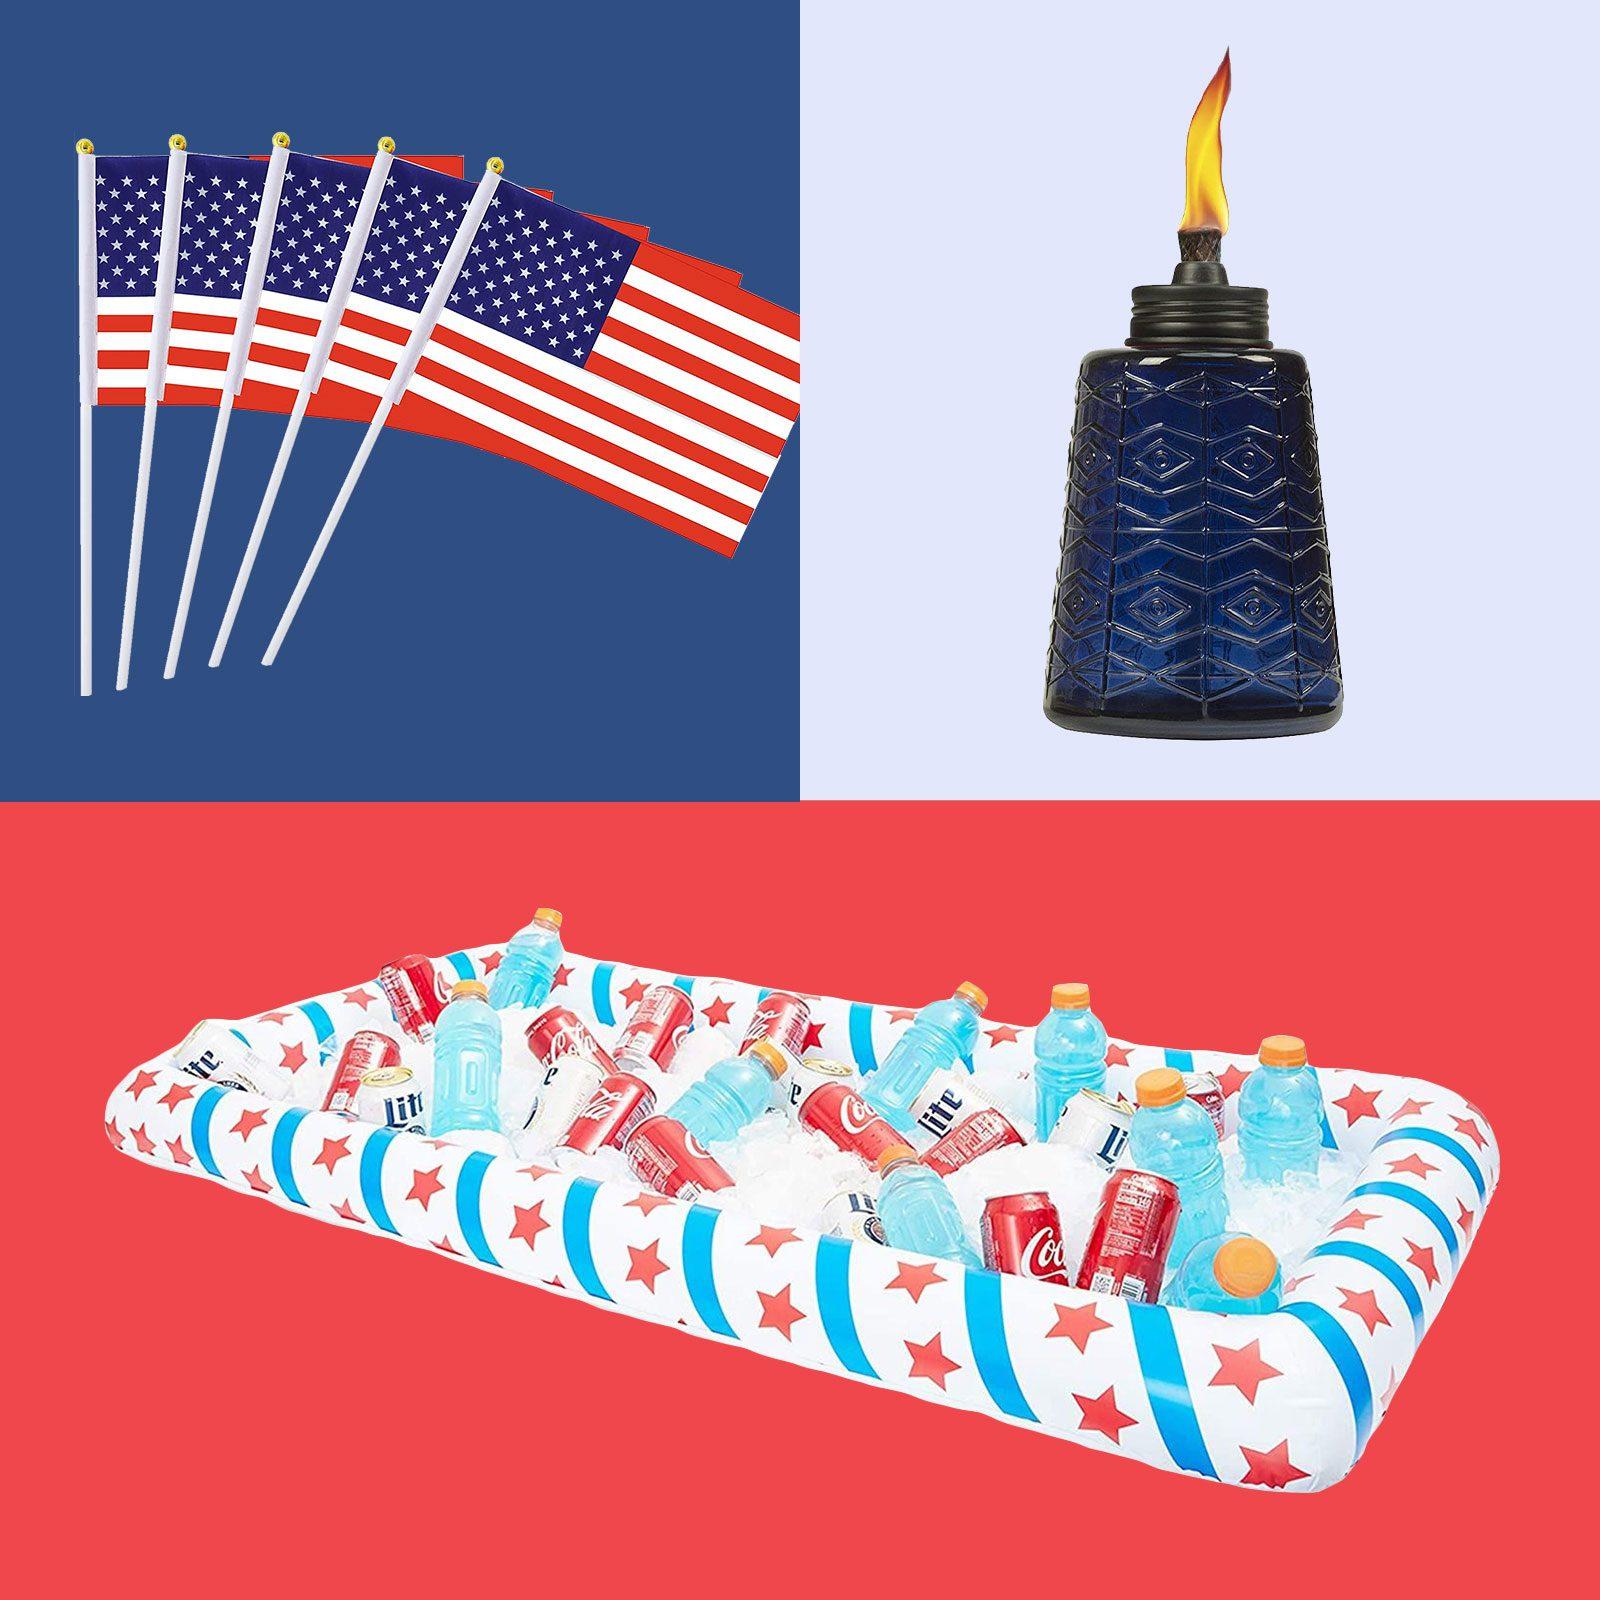 Patrioticdecorations